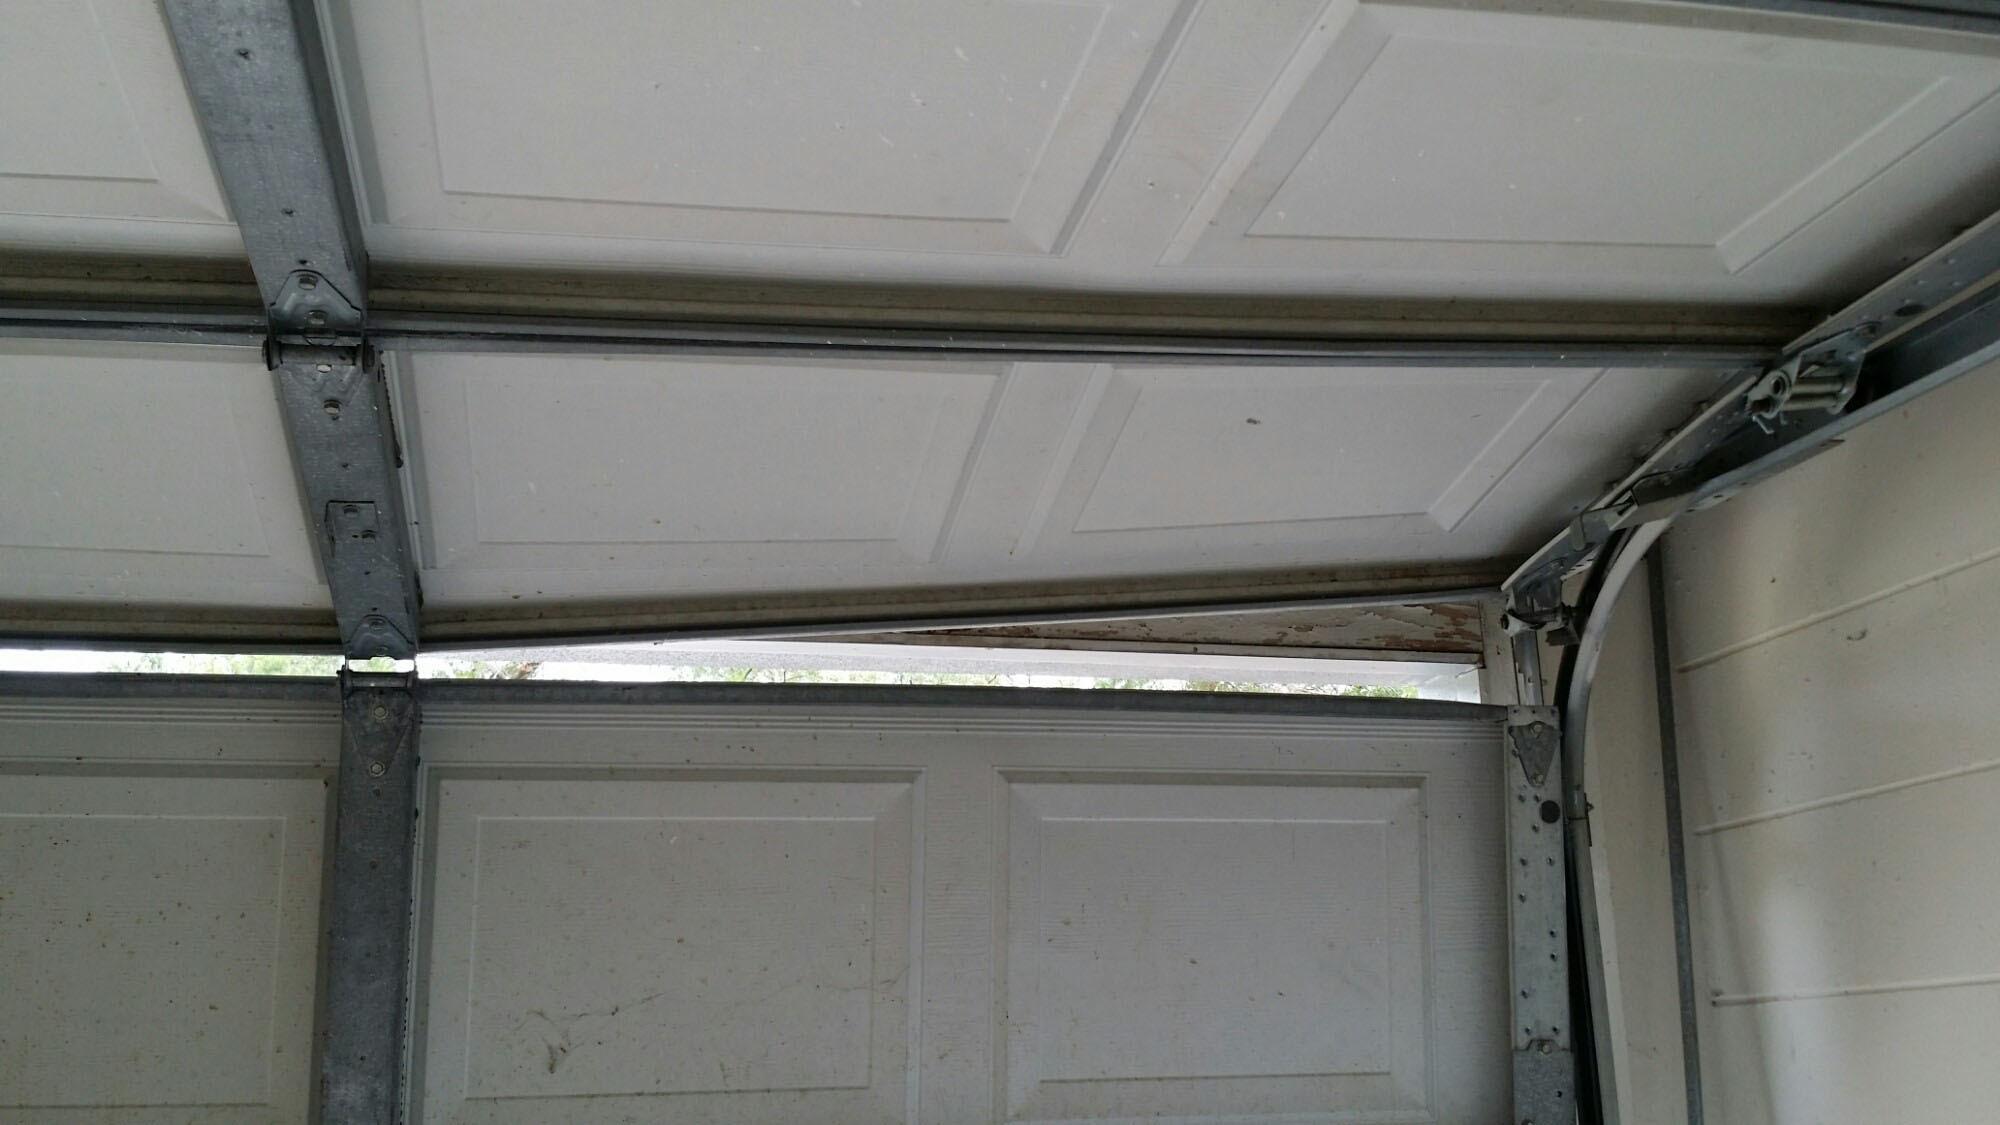 Repair doors auckland specialist broken and leaky shower repair auckland manukau garage rubansaba